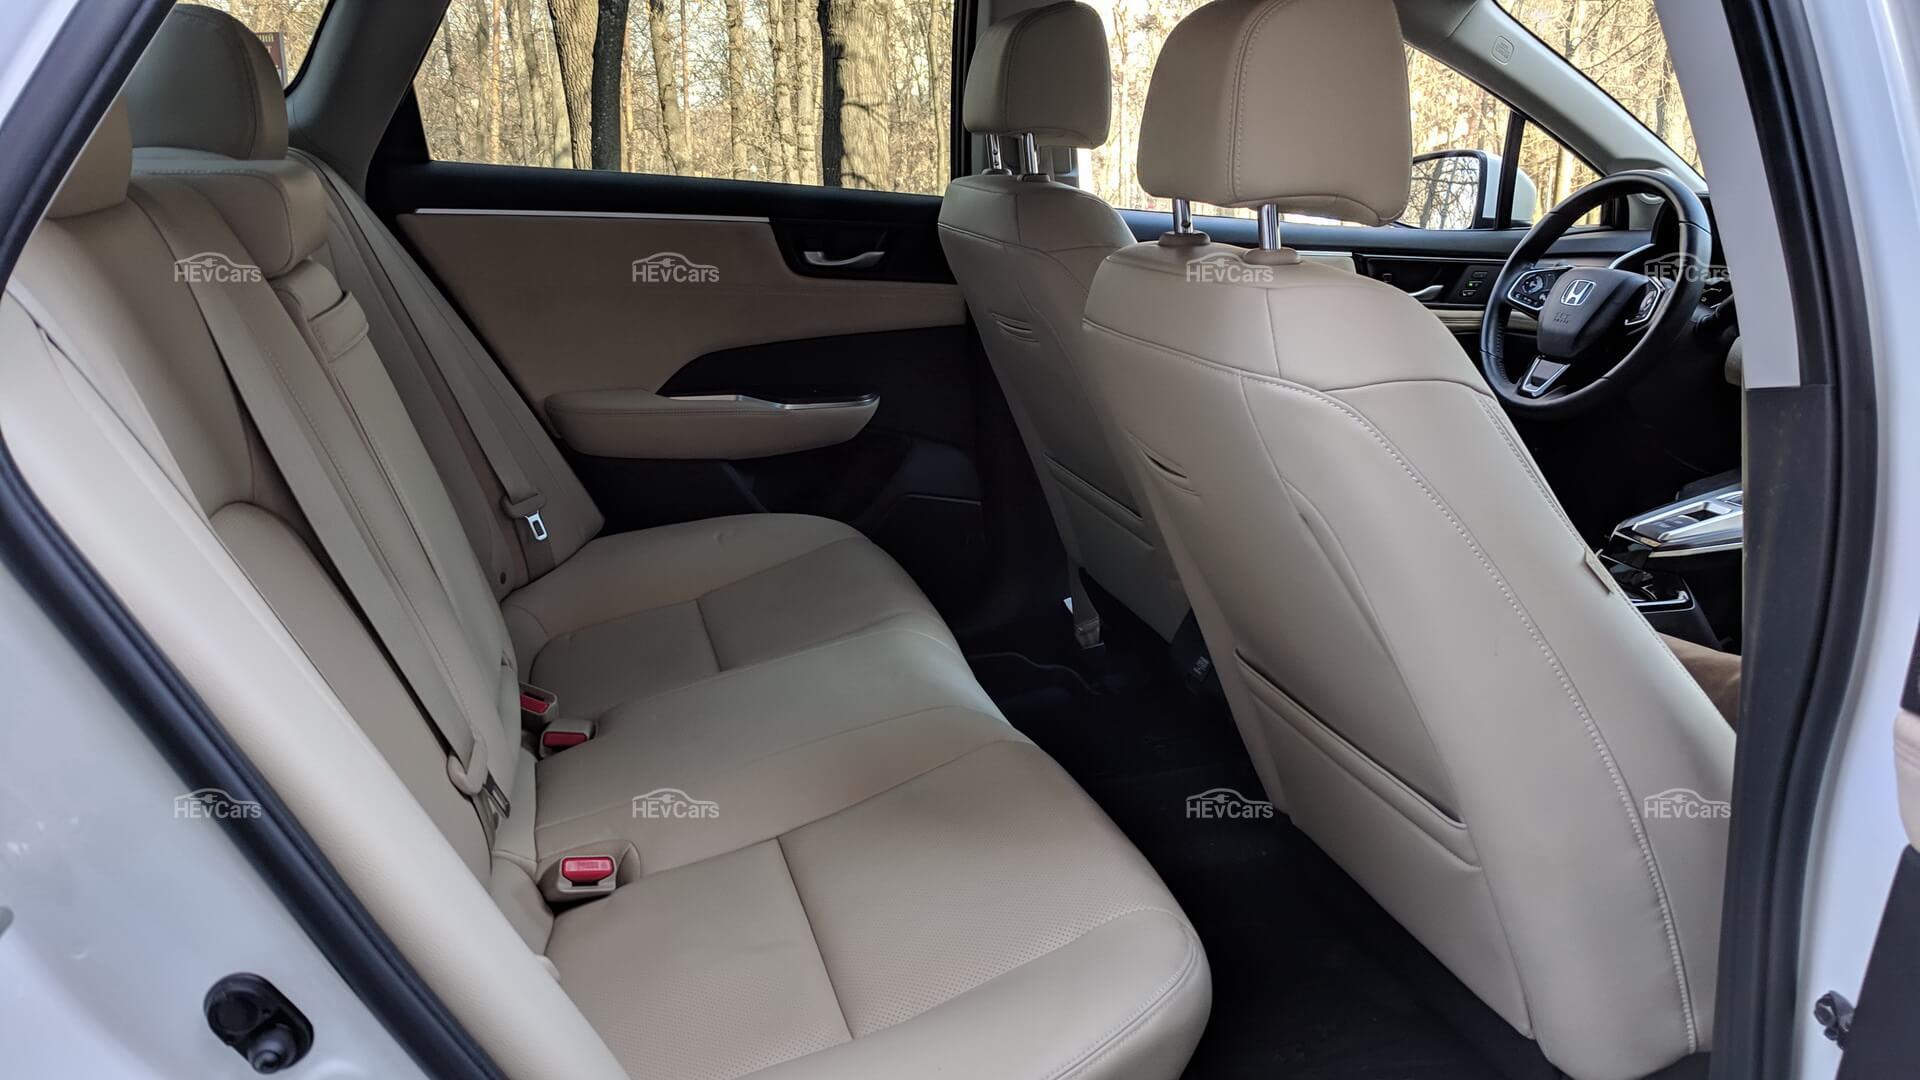 Задний ряд сидений плагин-гибрида Honda Clarity